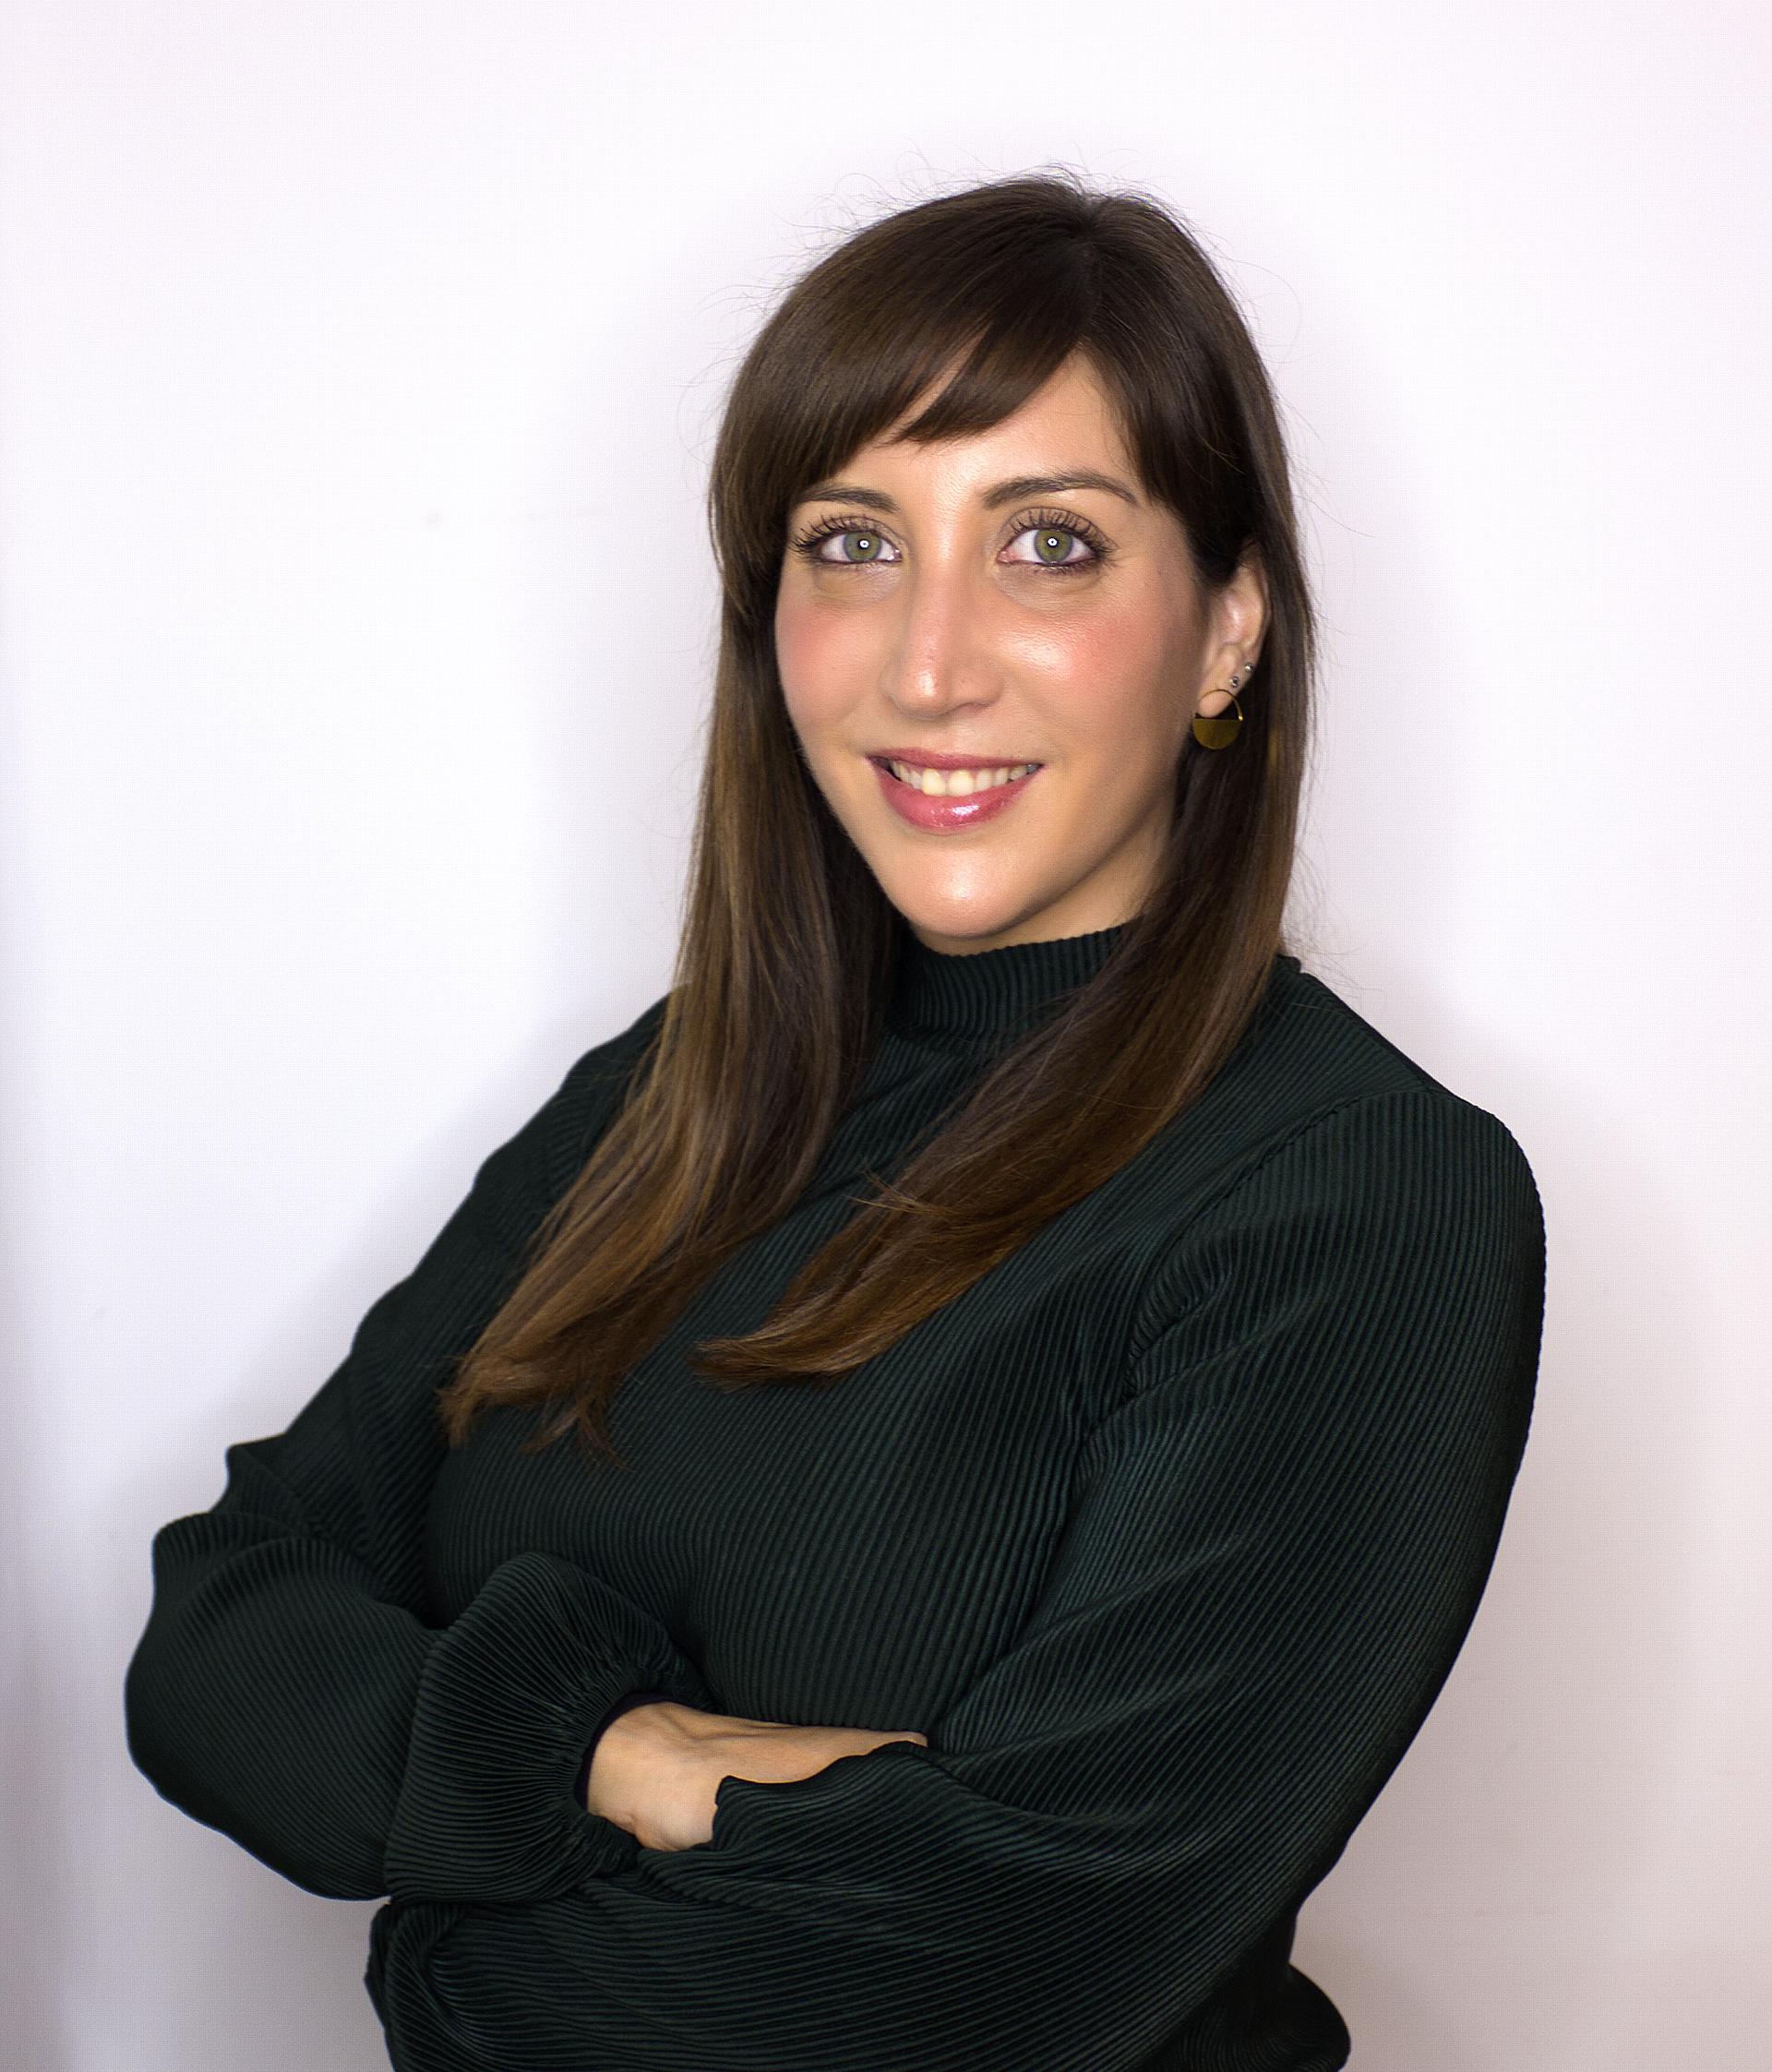 Sílvia Ruiz Babot